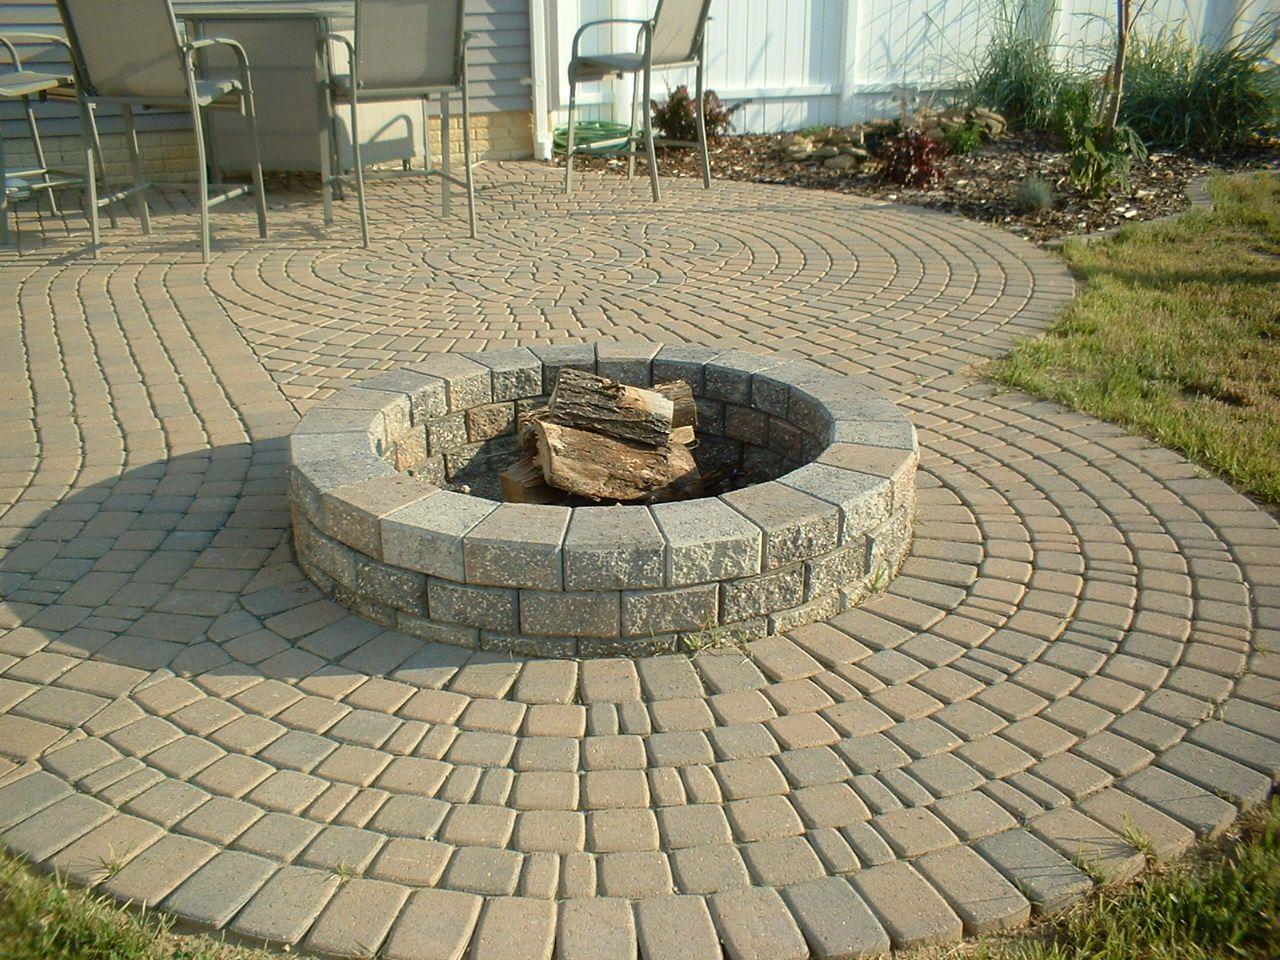 Stone Pavers Patio Design Ideas Made With Home Depot Brick Price Concrete